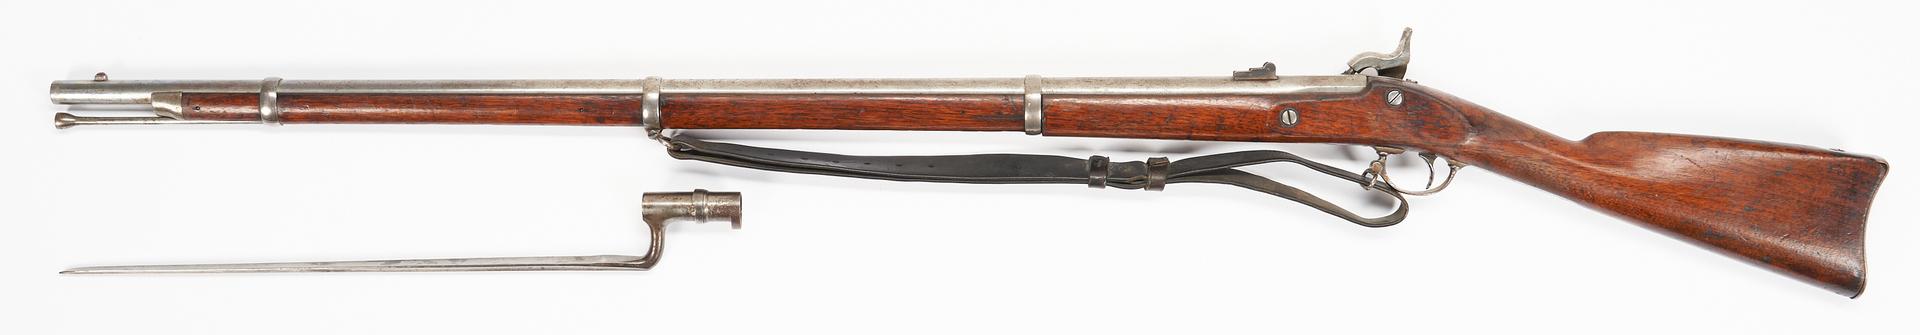 Lot 761: Springfield Model 1863 Type II Rifle w/ Bayonet